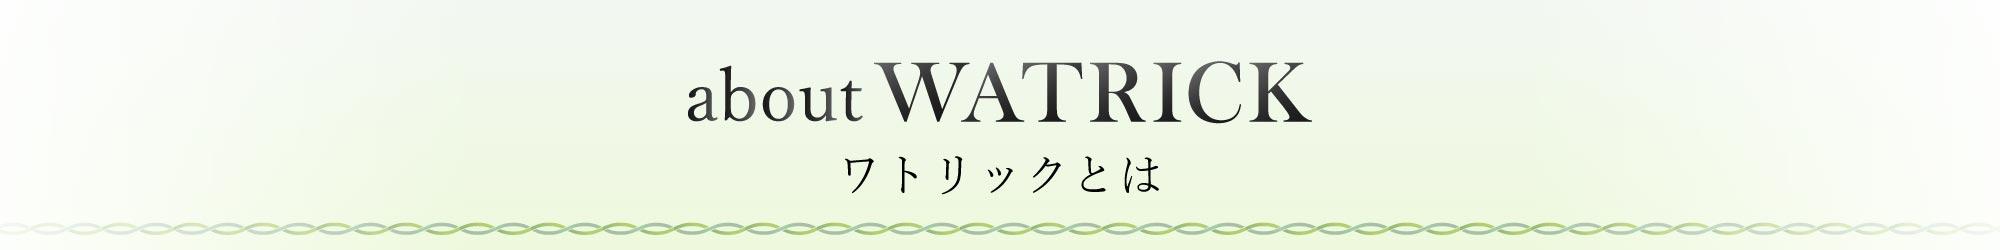 WATRICKとは?